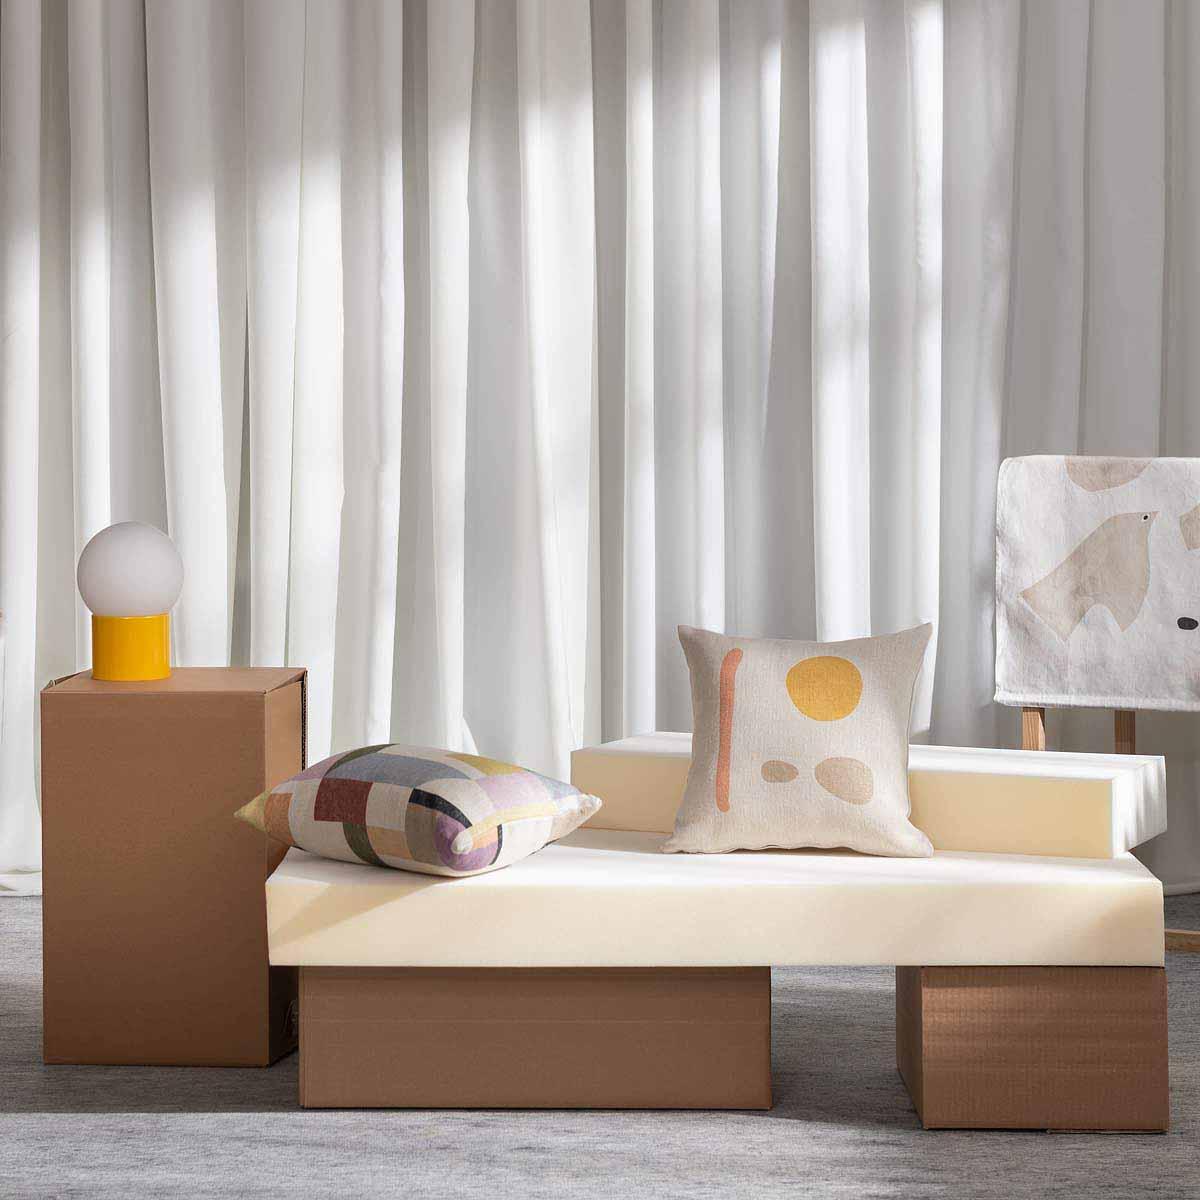 ambiance décoration minimaliste